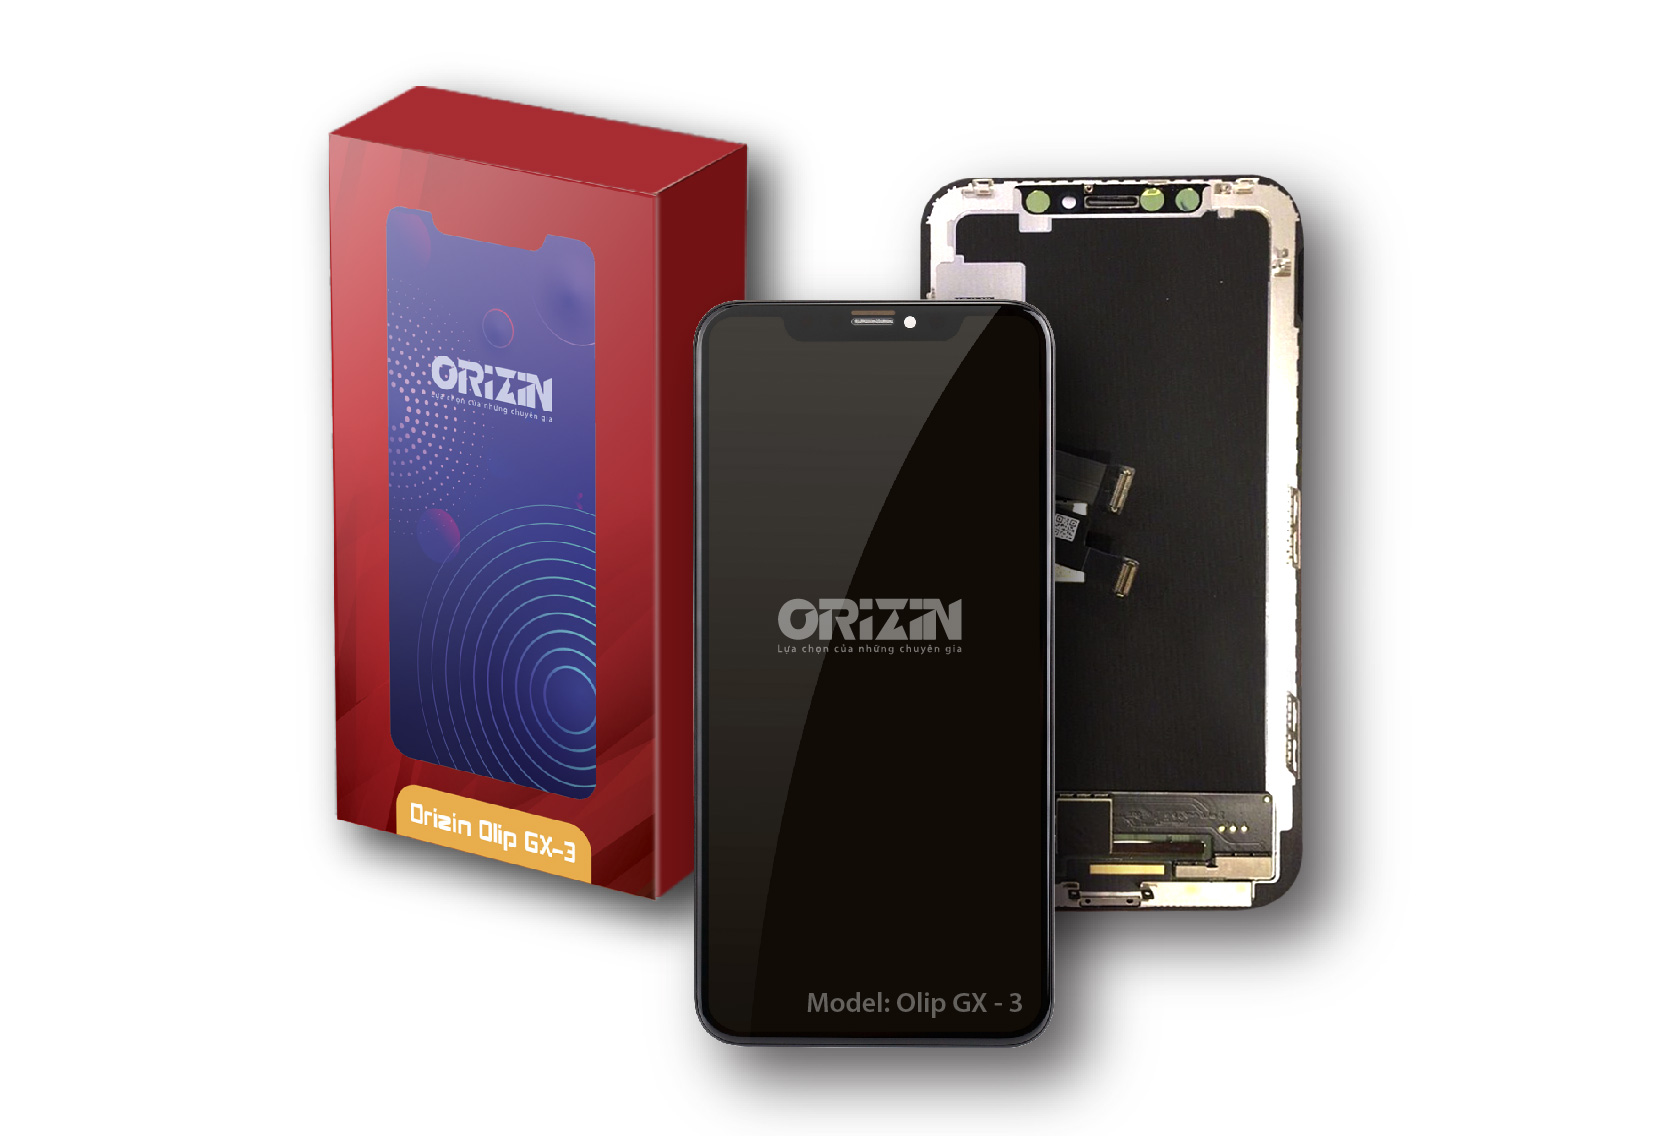 Màn Hình Orizin Olip GX-3